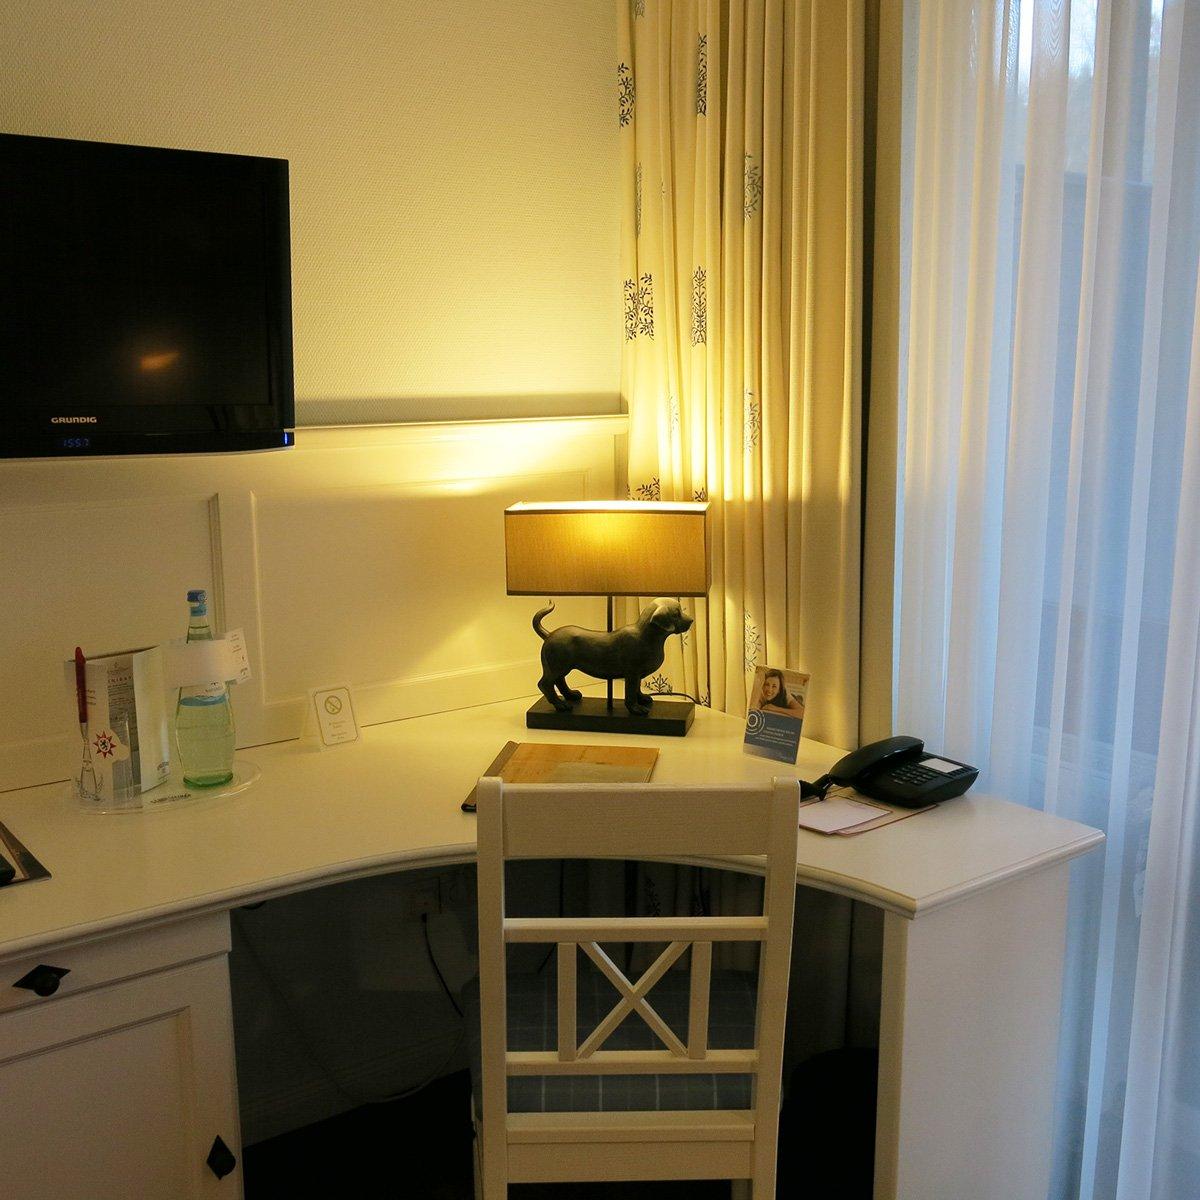 Einzelzimmer Impressionen, Hotel 3-Quellen-Therme, Bad Griesbach, Wellness, Beauty, Conny Doll Lifestyle